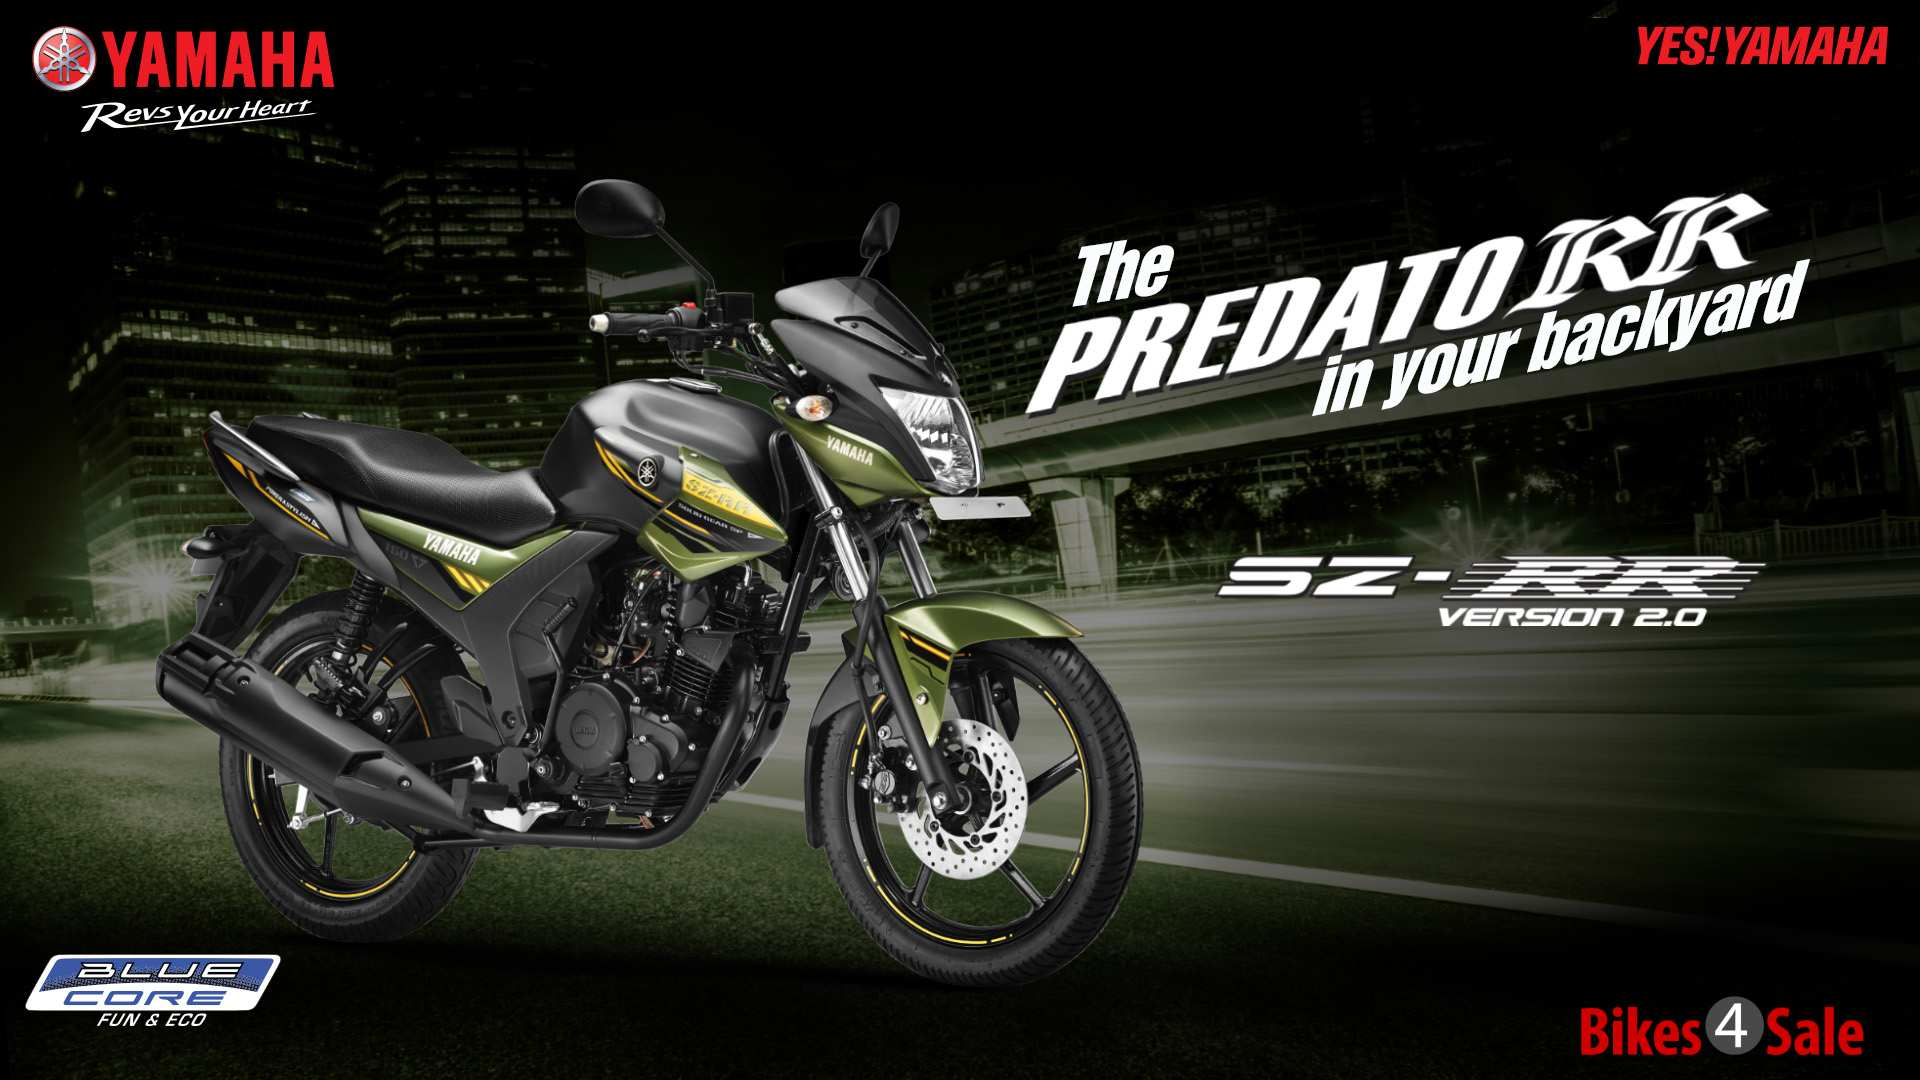 Yamaha Sz Rr V2 Price Specs Mileage Colours Photos And